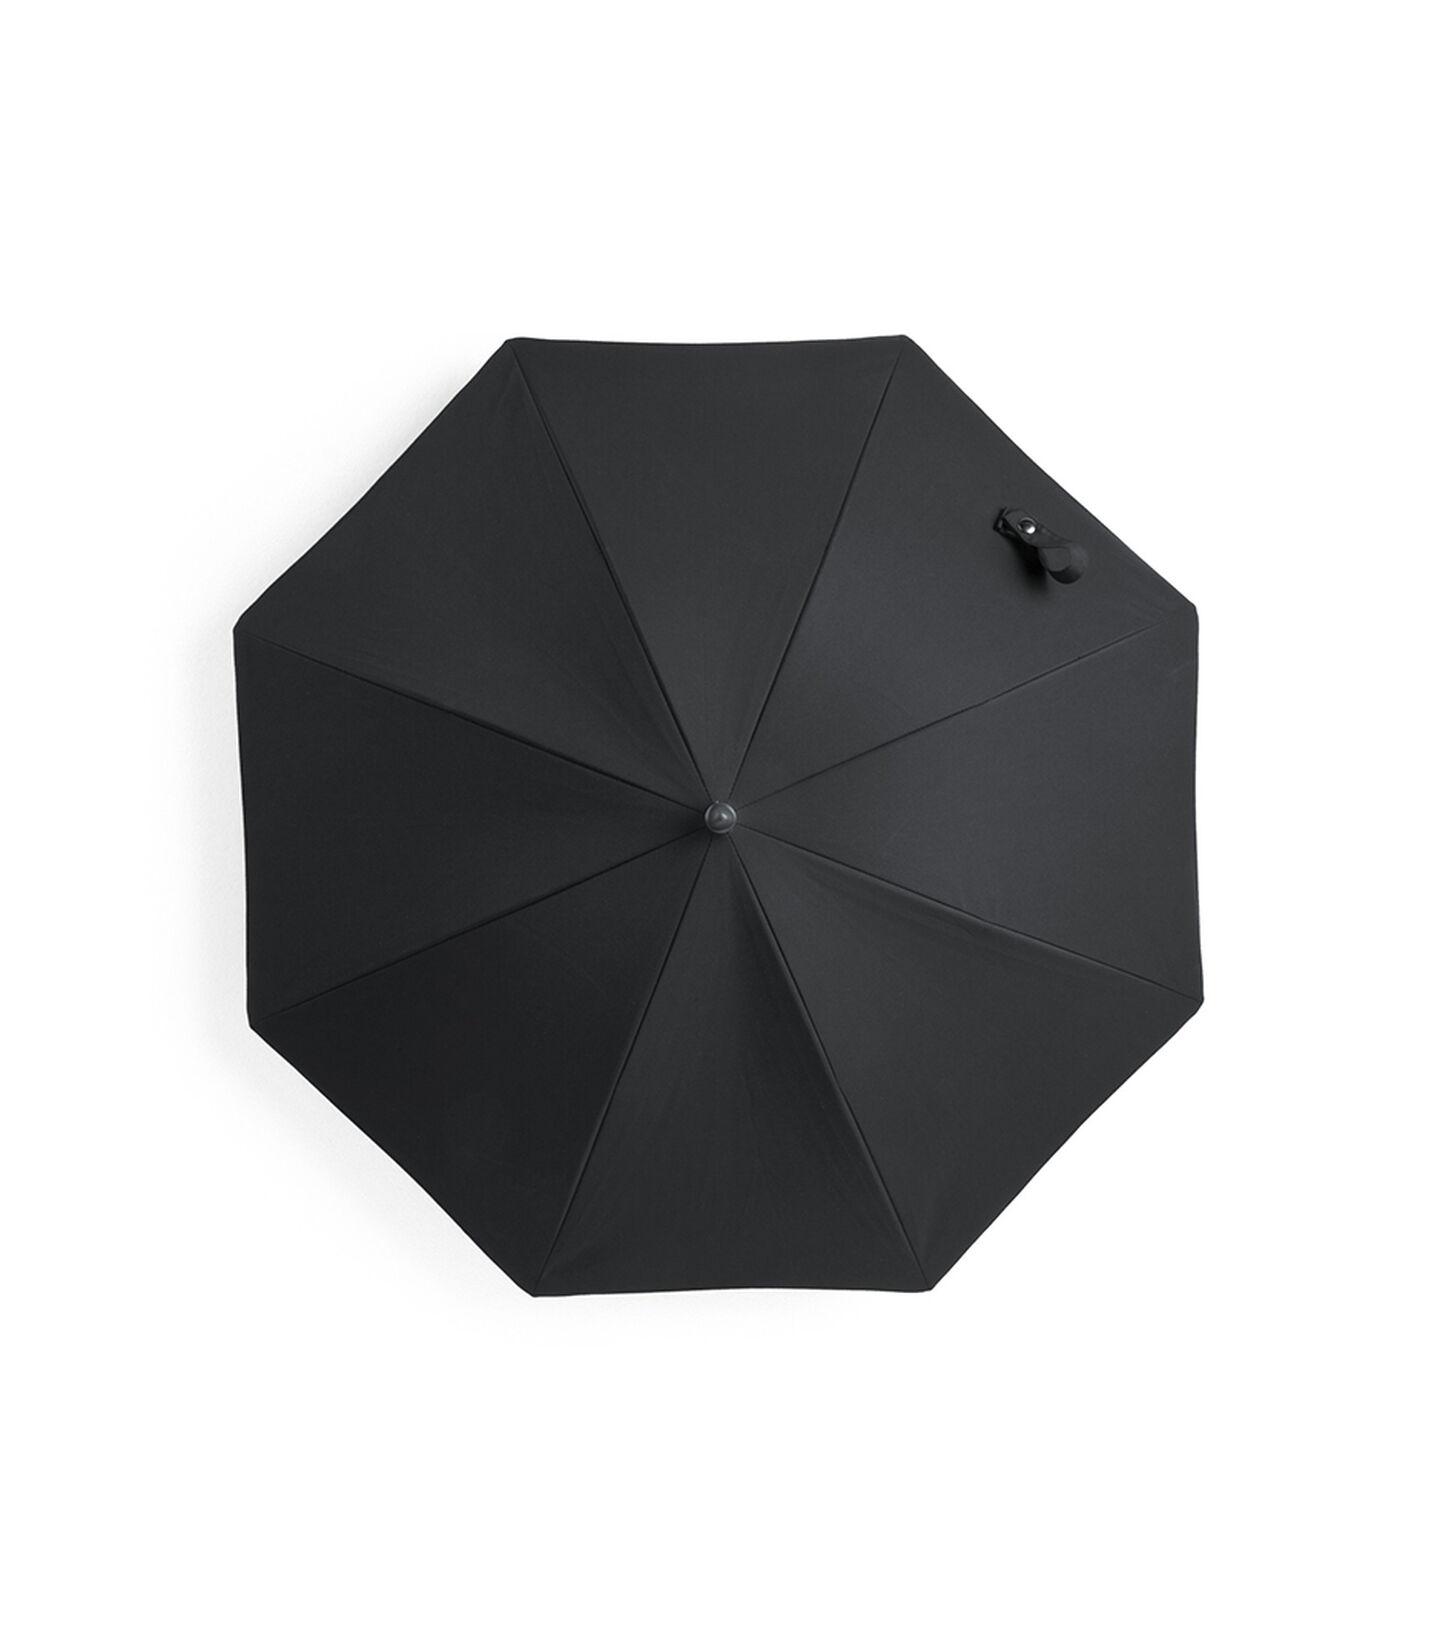 Stokke® Stroller Black Parasol Black, Nero, mainview view 2